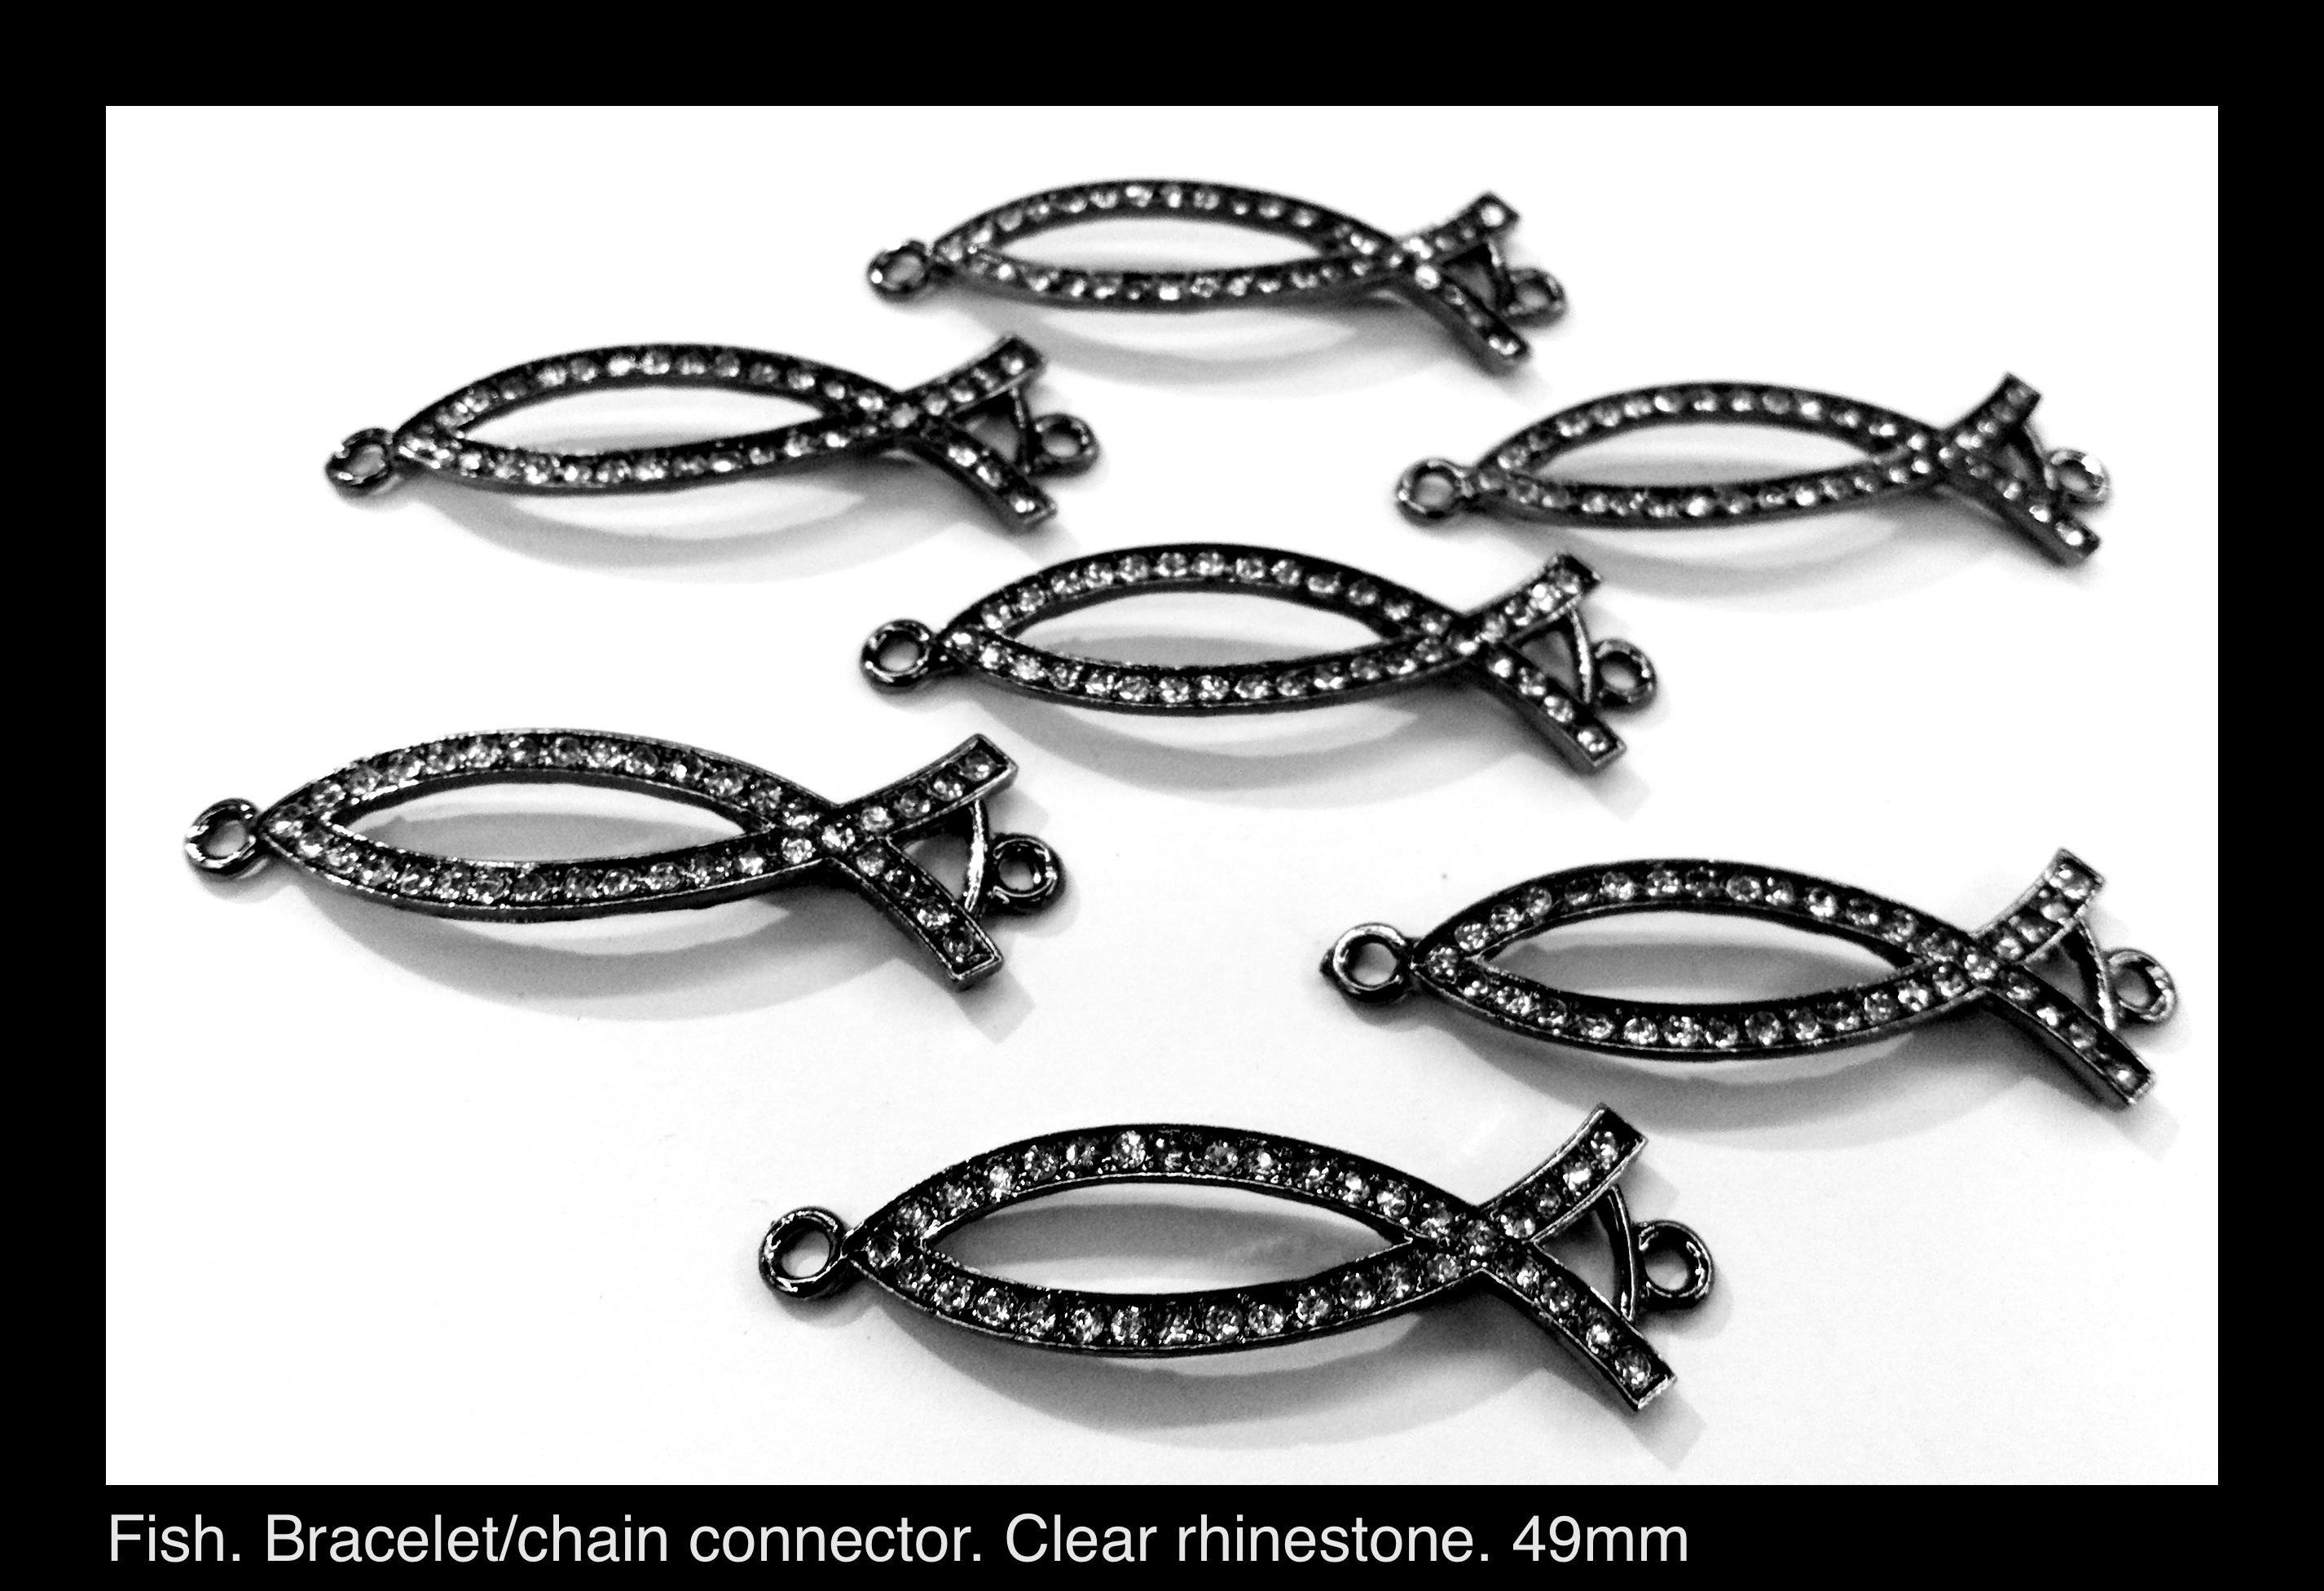 Fish Bracelet Connector 49mm 6pcs Beadshines Online